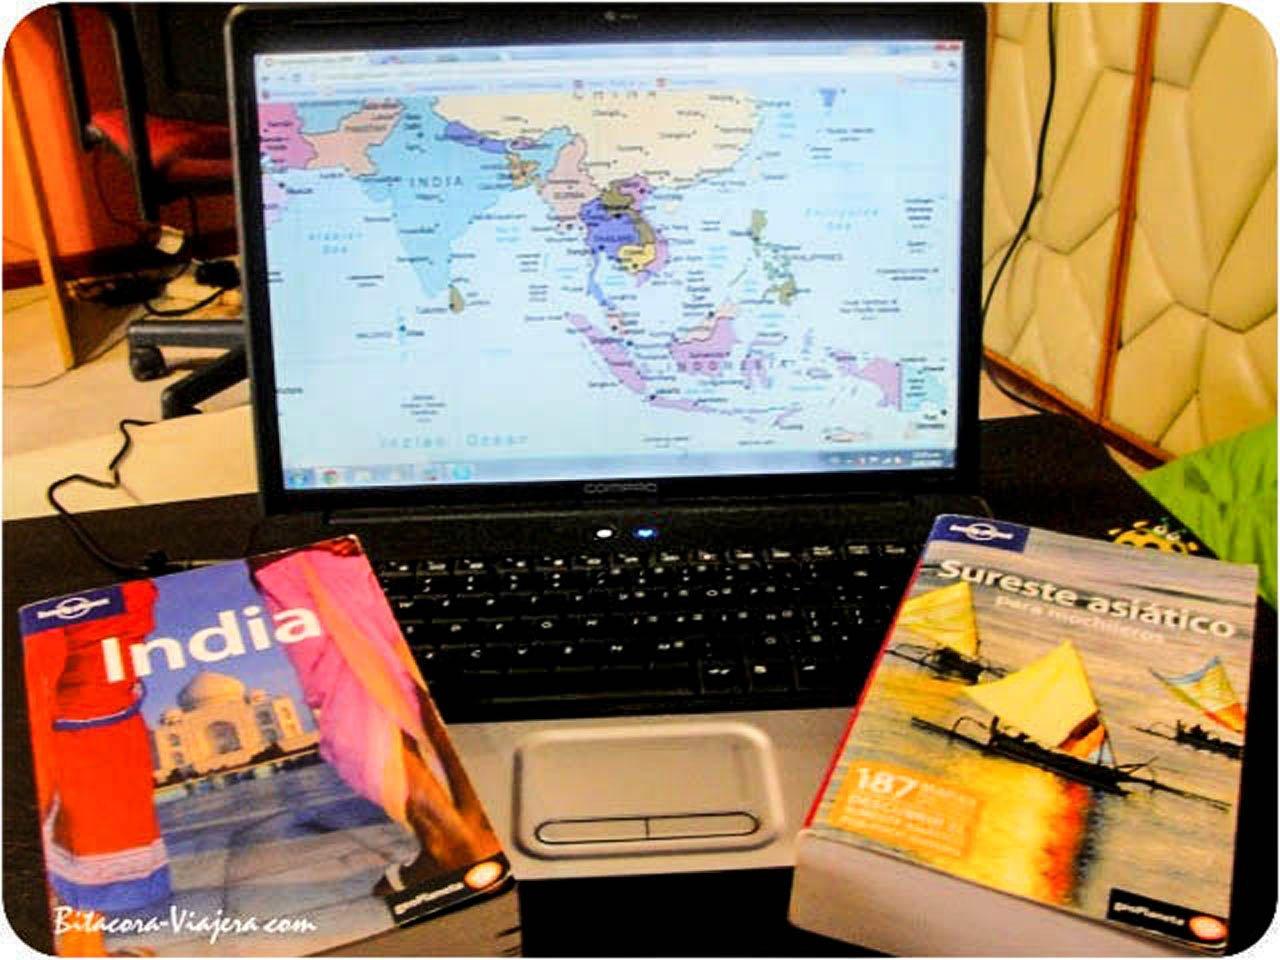 guia-viajar-sudeste-asiatico-india-nepal-1